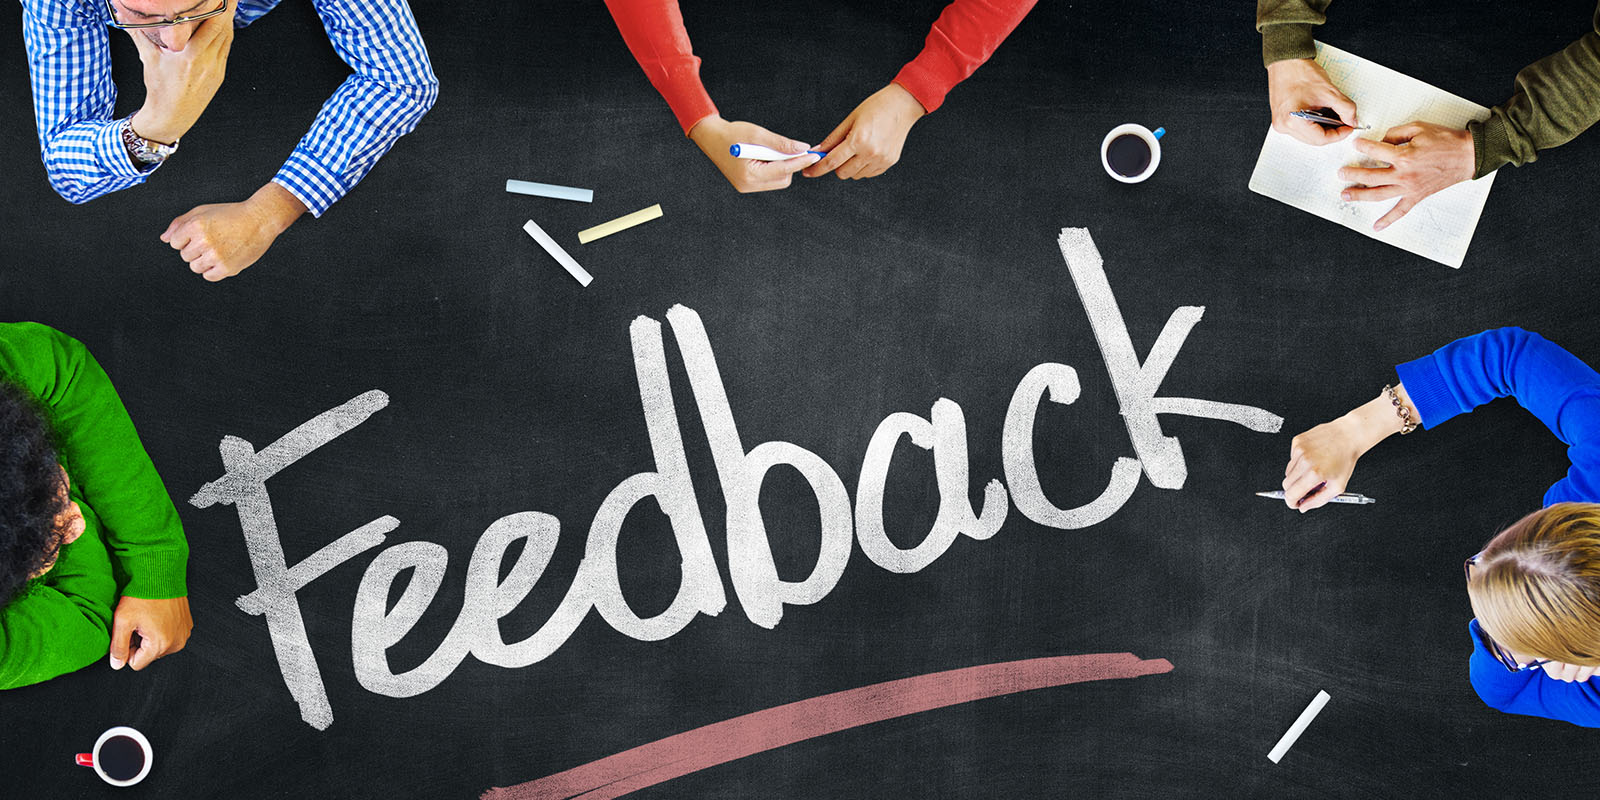 Education feedback